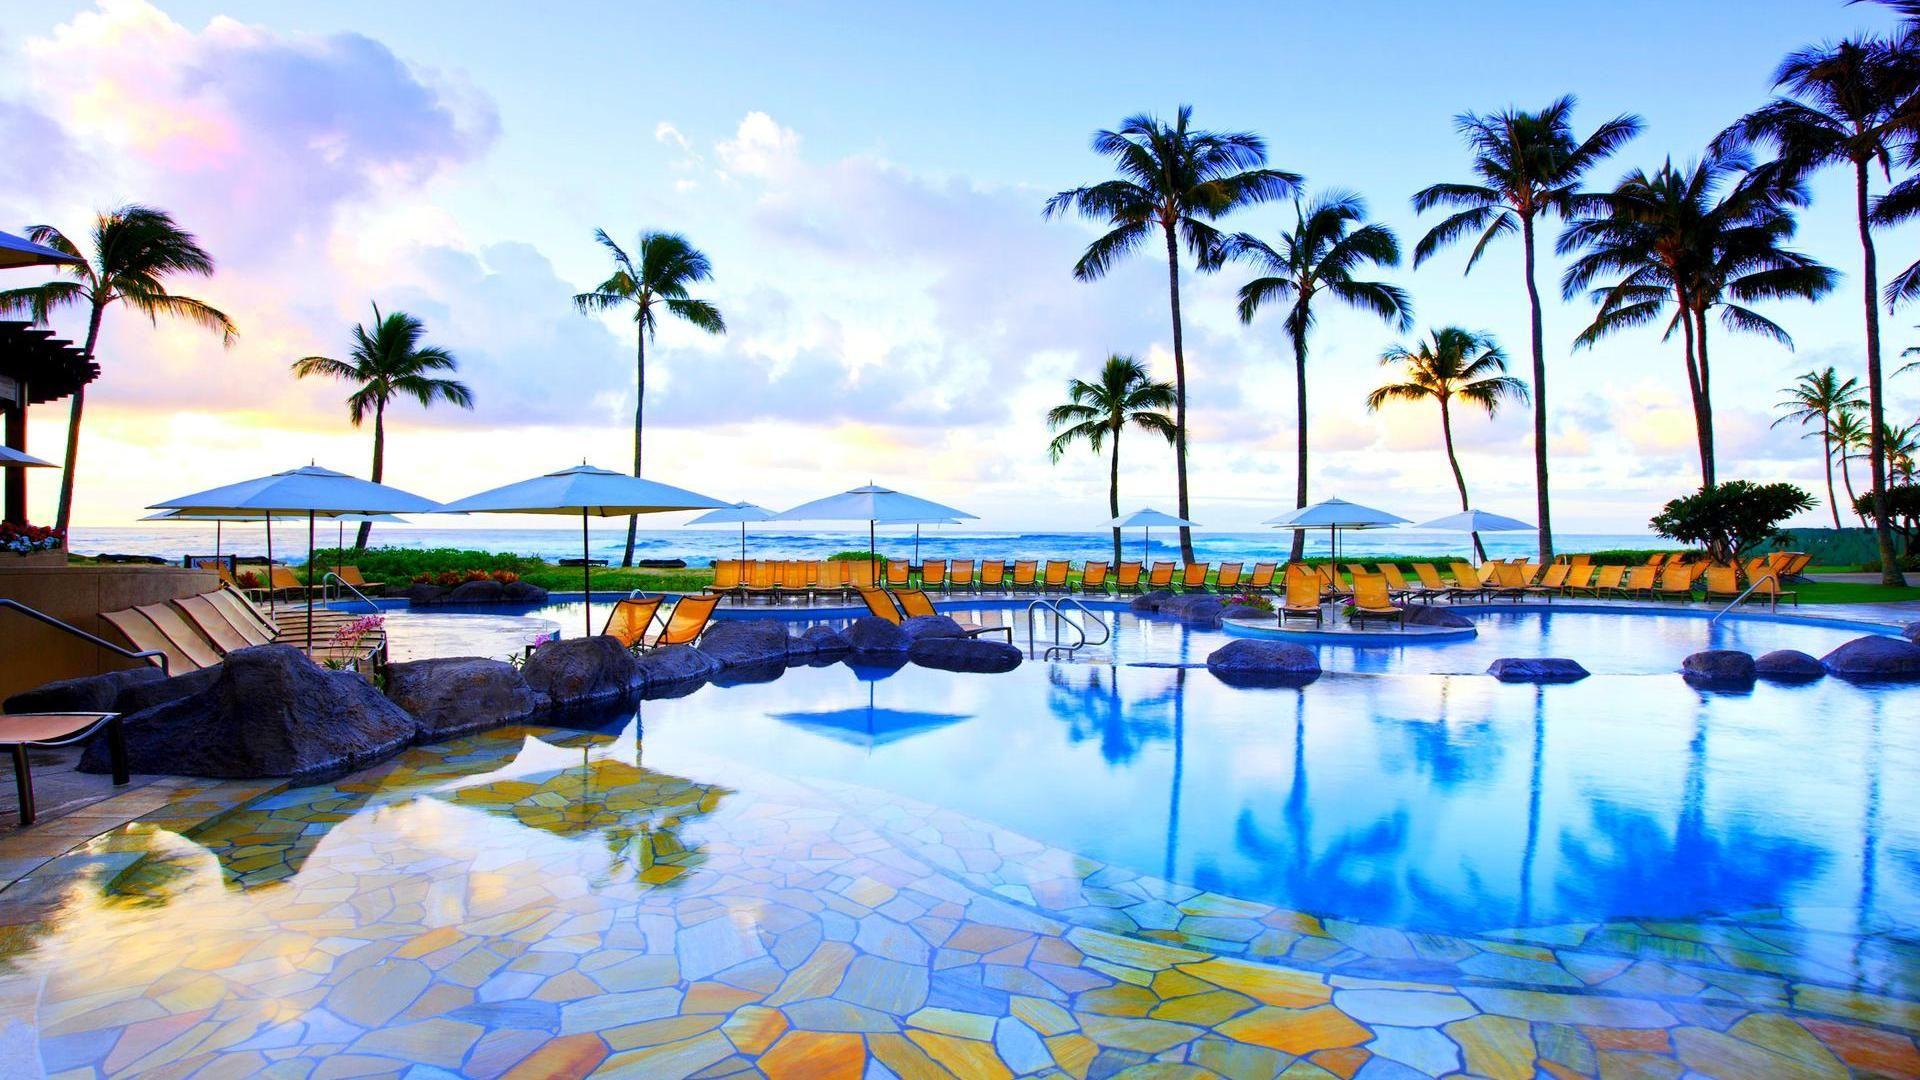 Beautiful Resort Pool In Kauai Hawaii Hd Desktop Background Wallpaper Free Travel Oceania In